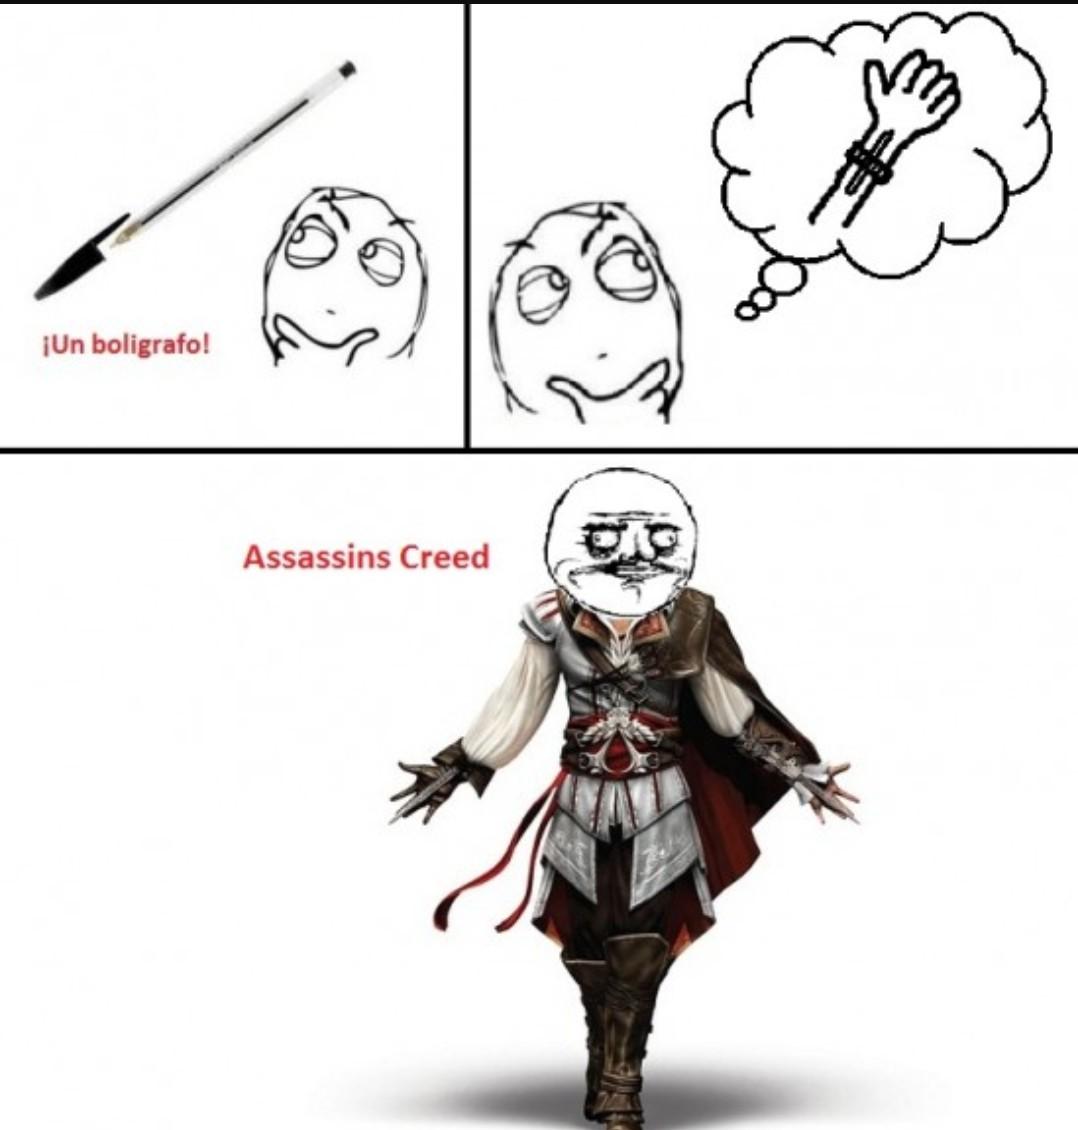 Assassin's Creed - meme